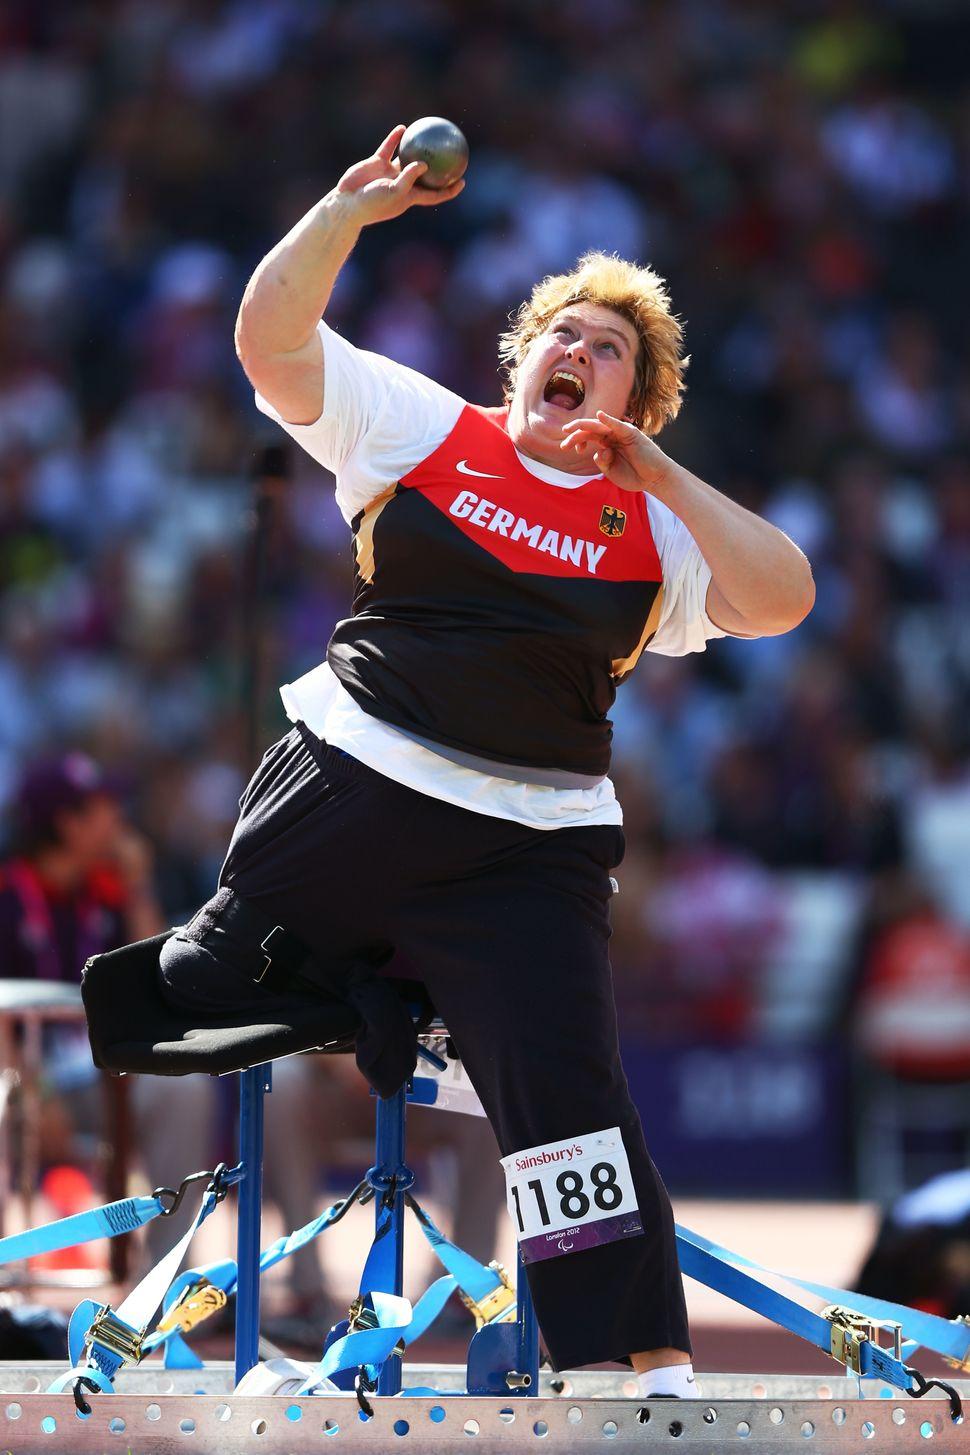 Germany's Ilke Wyludda competes in women's shot put inLondon.